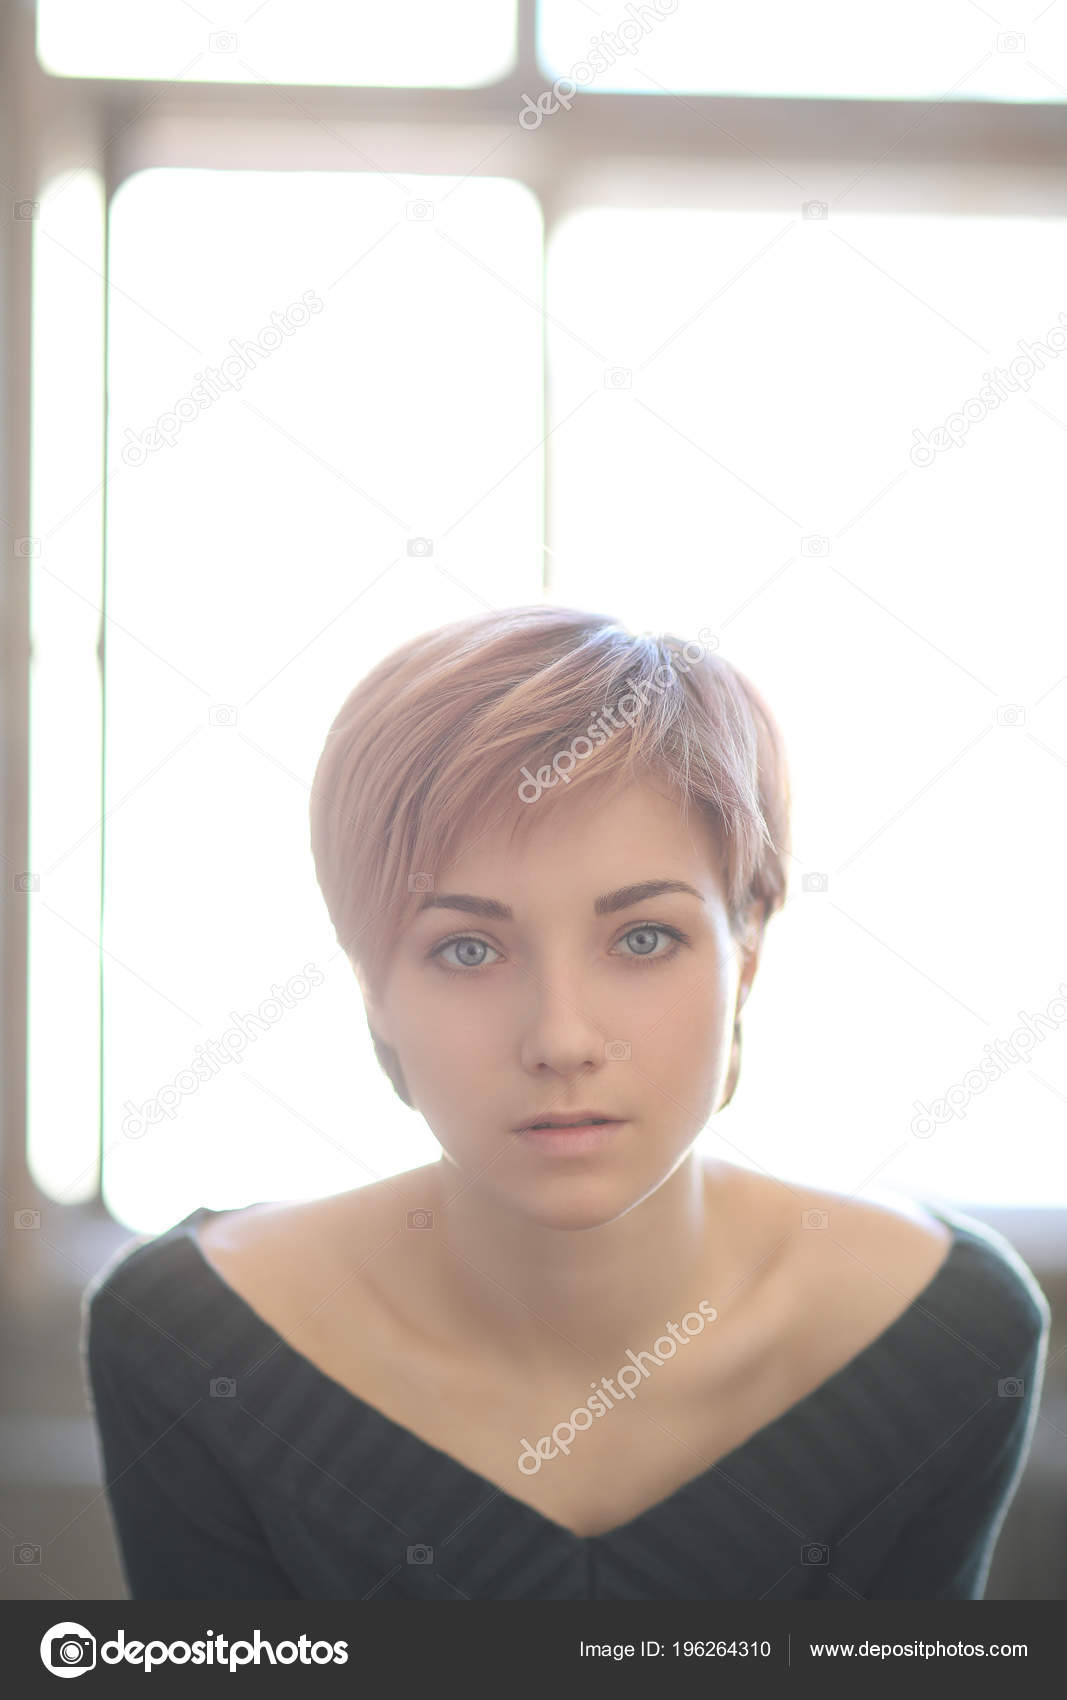 Cortes de cabello para dama joven cortos